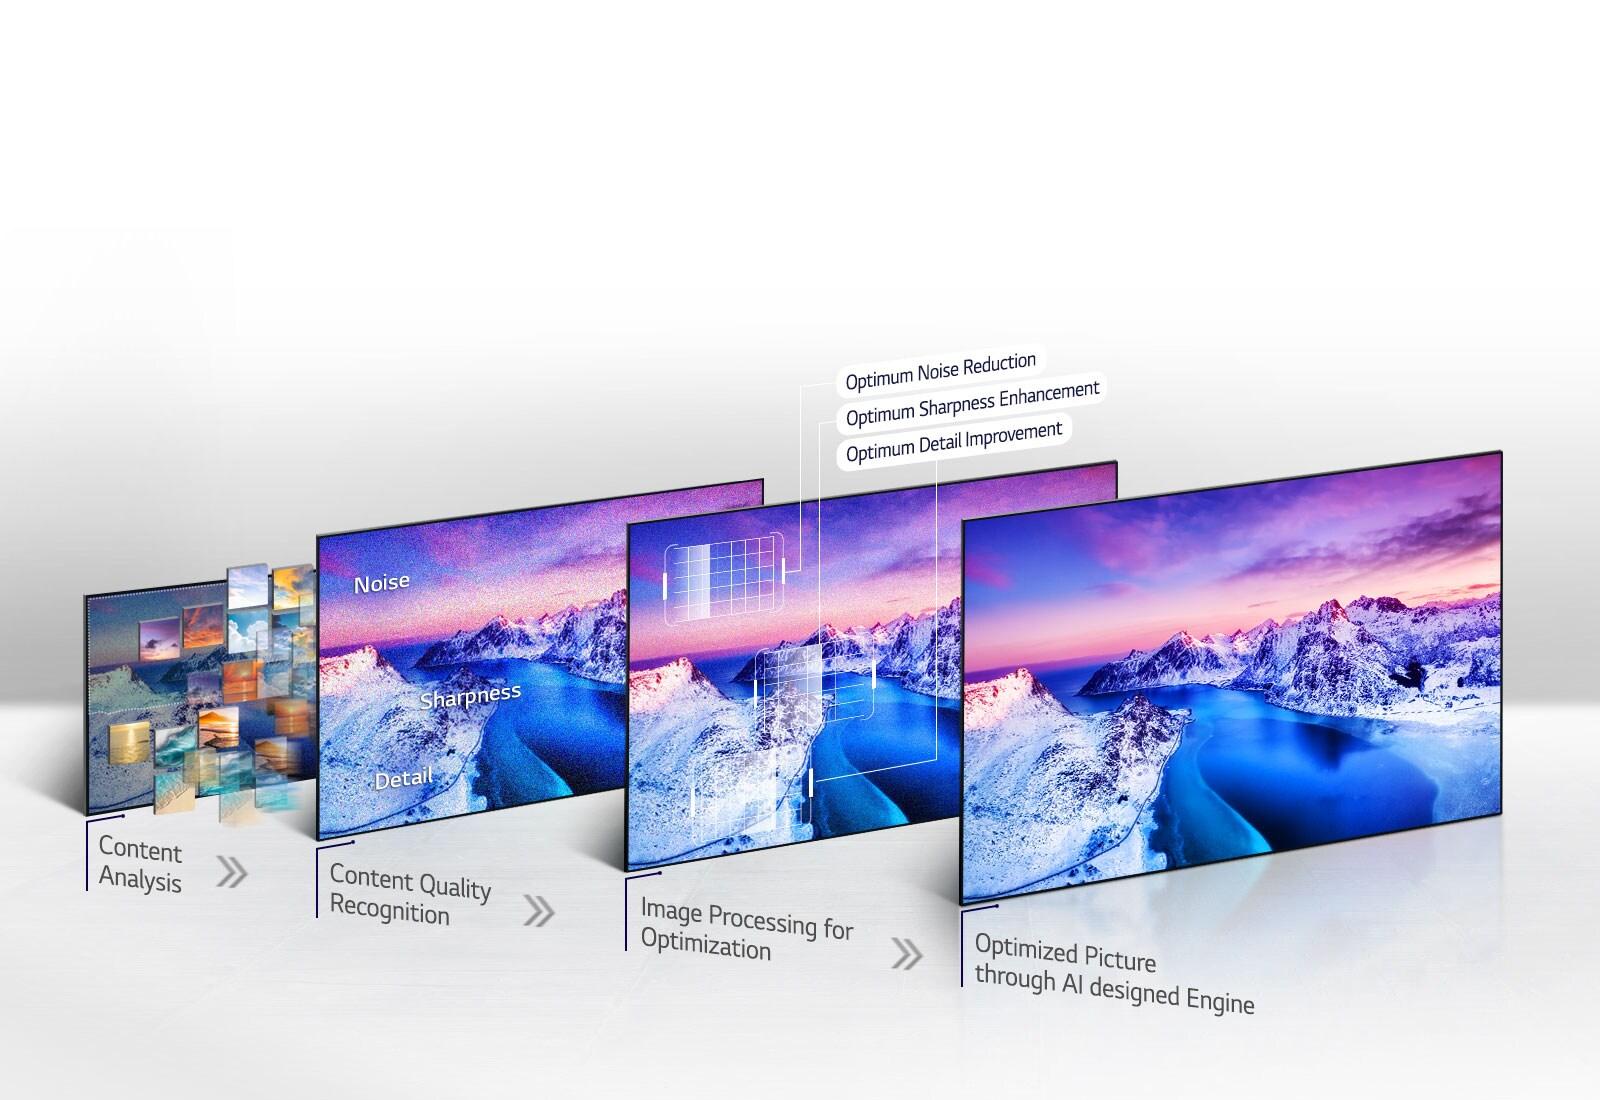 LG NanoCell TV AI Picture